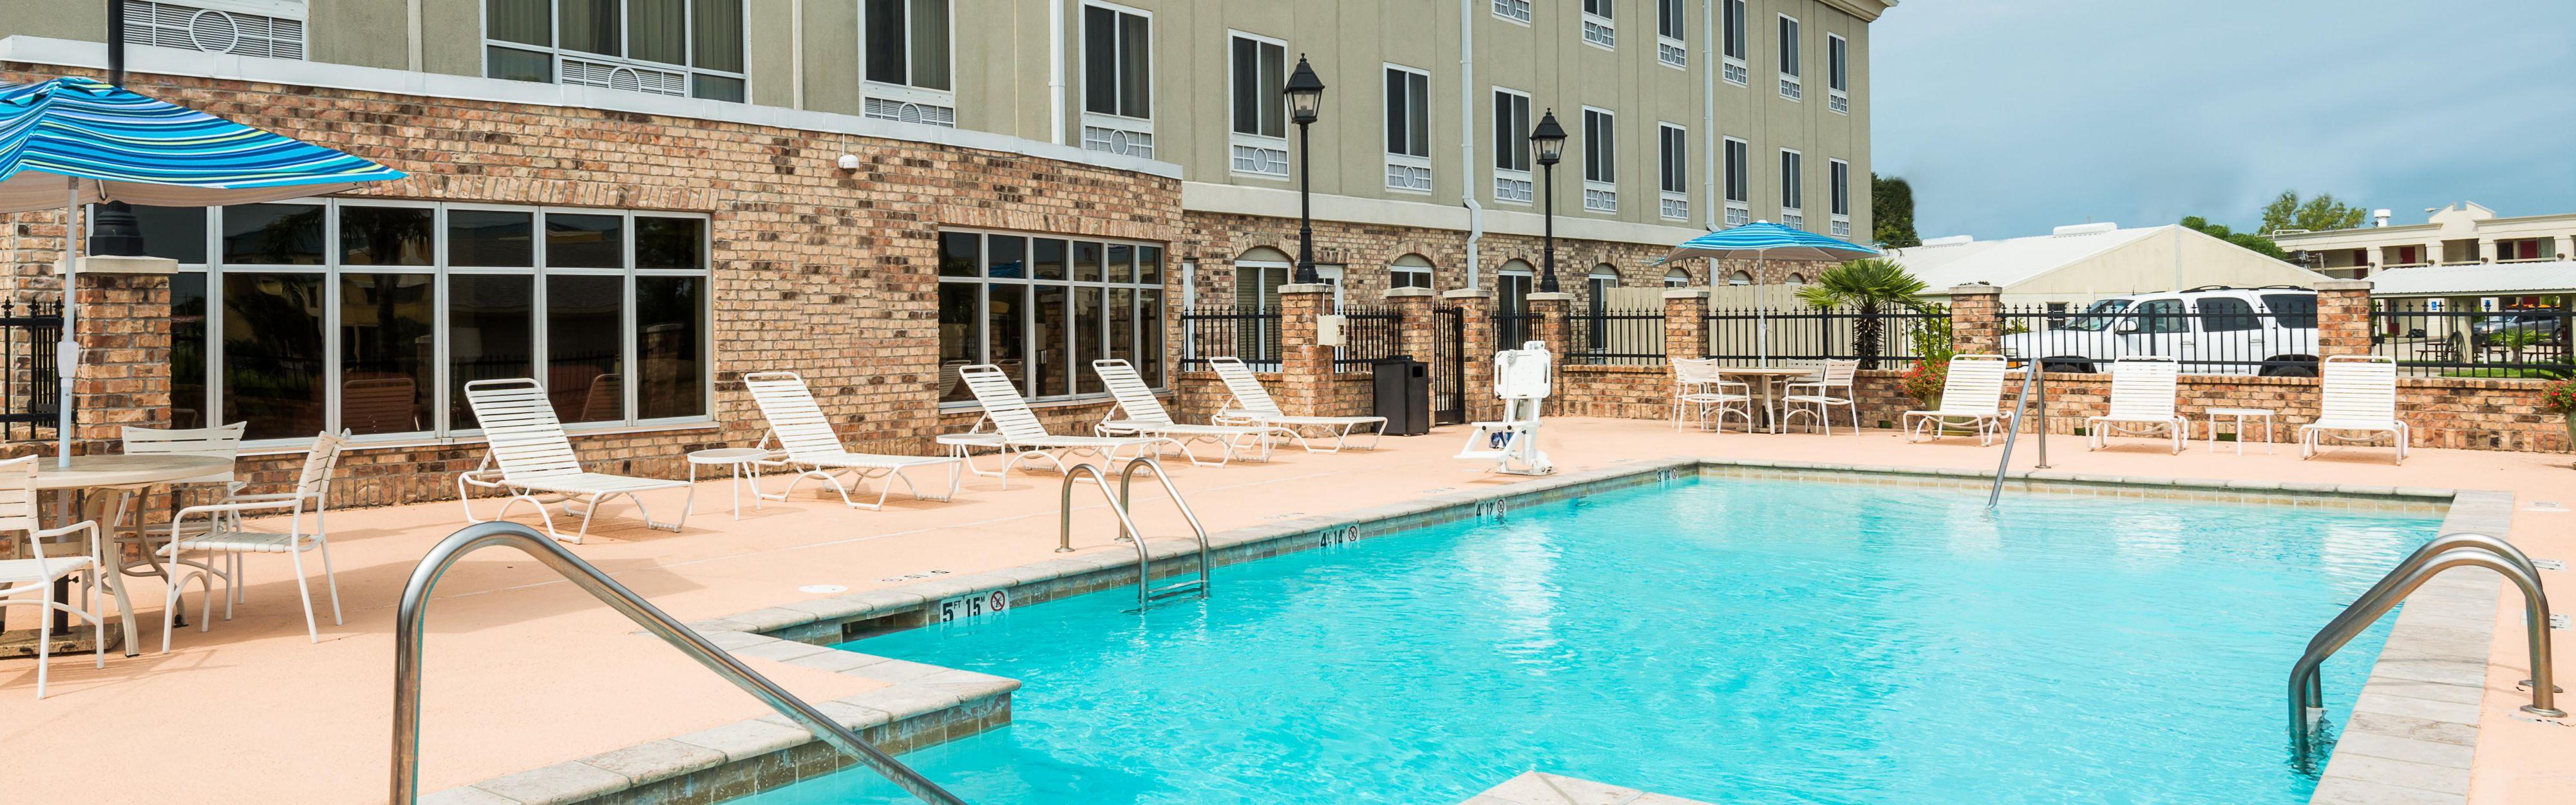 Holiday Inn Express & Suites New Iberia-Avery Island image 2